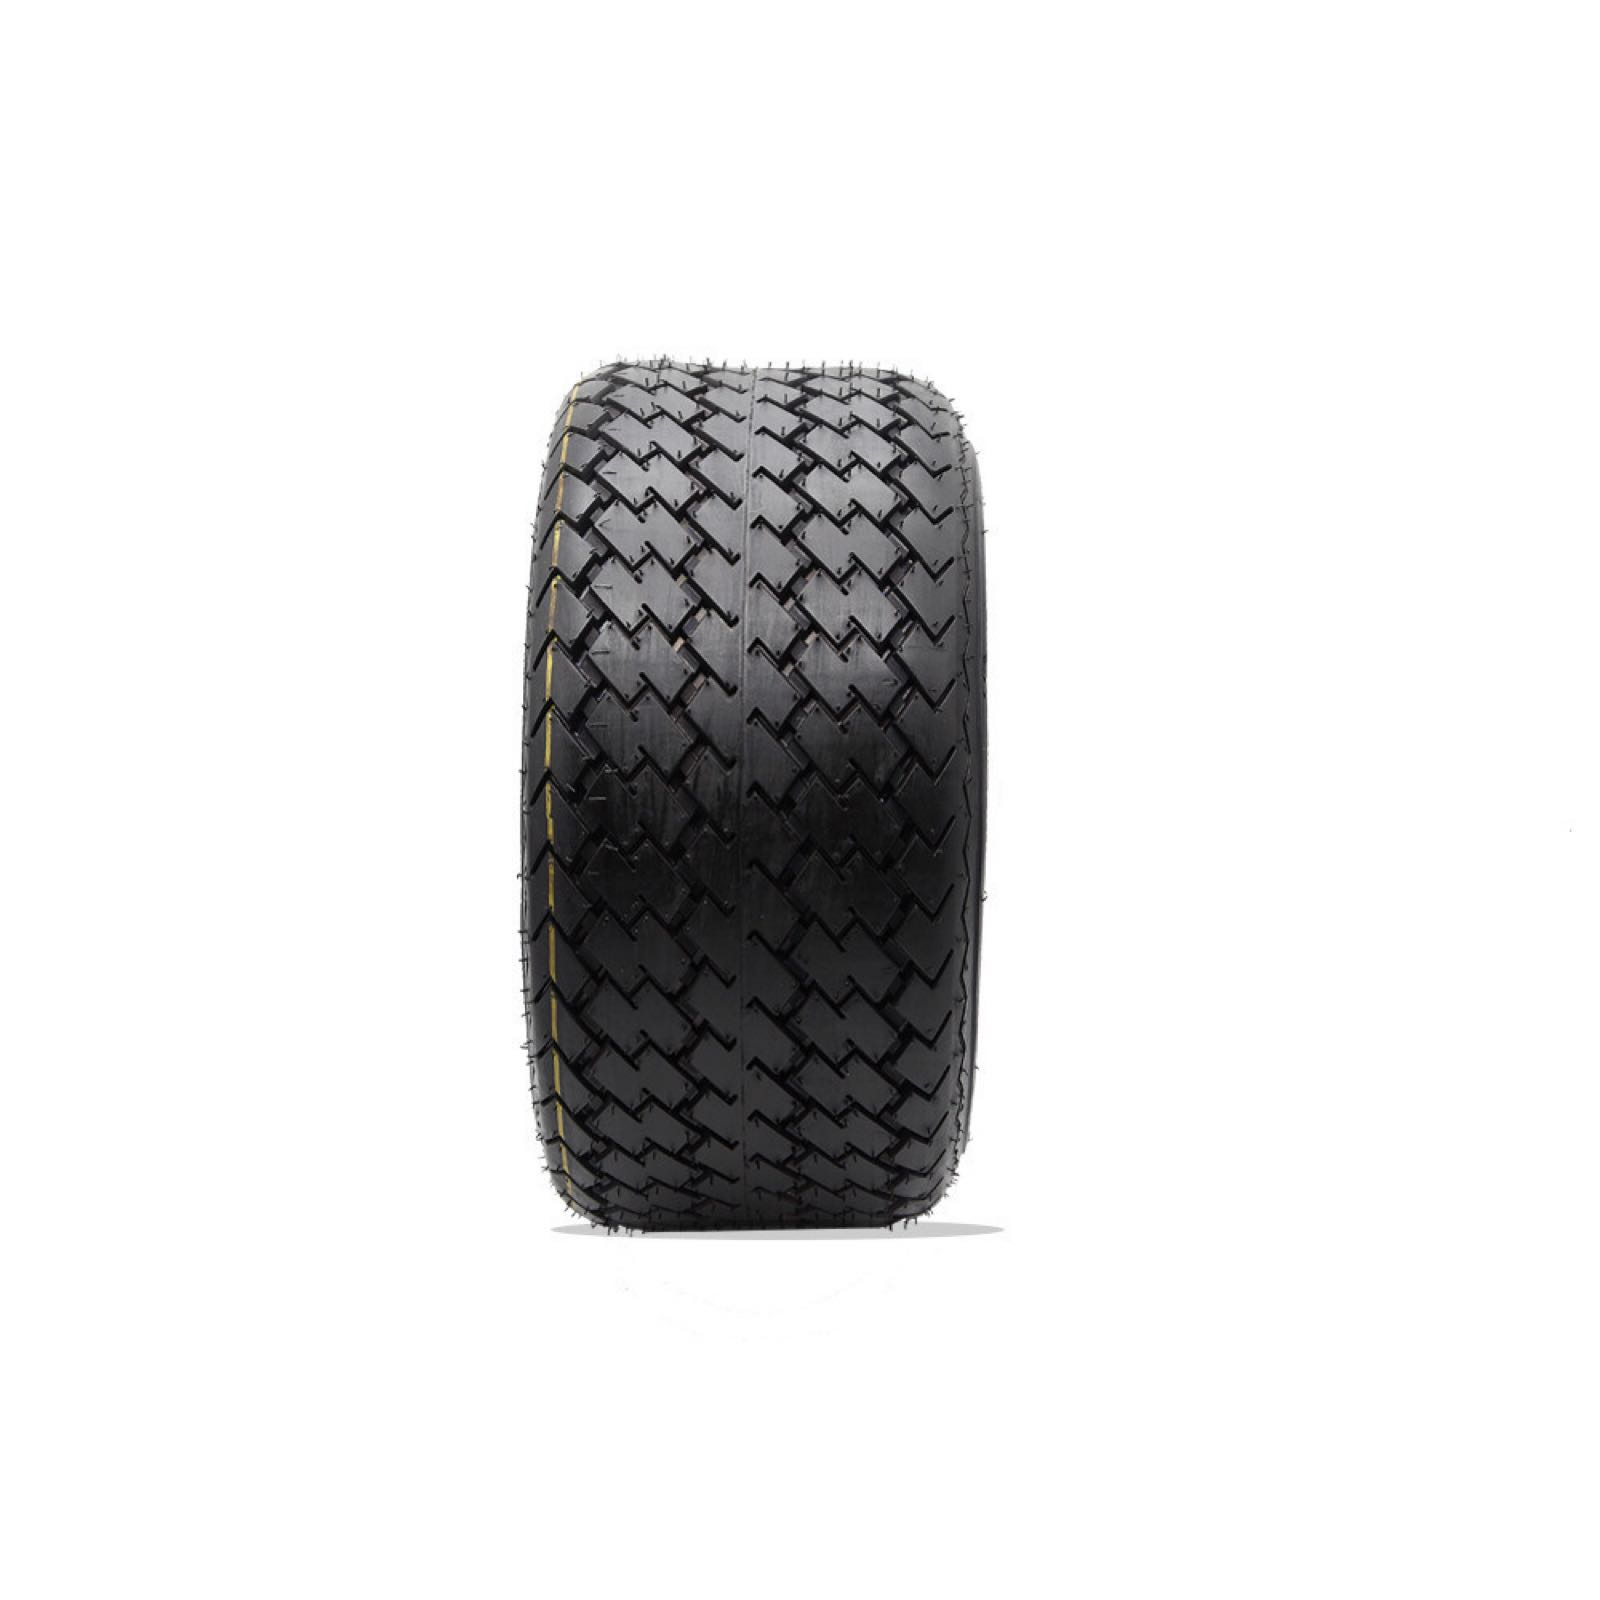 Watta tyre (rough)